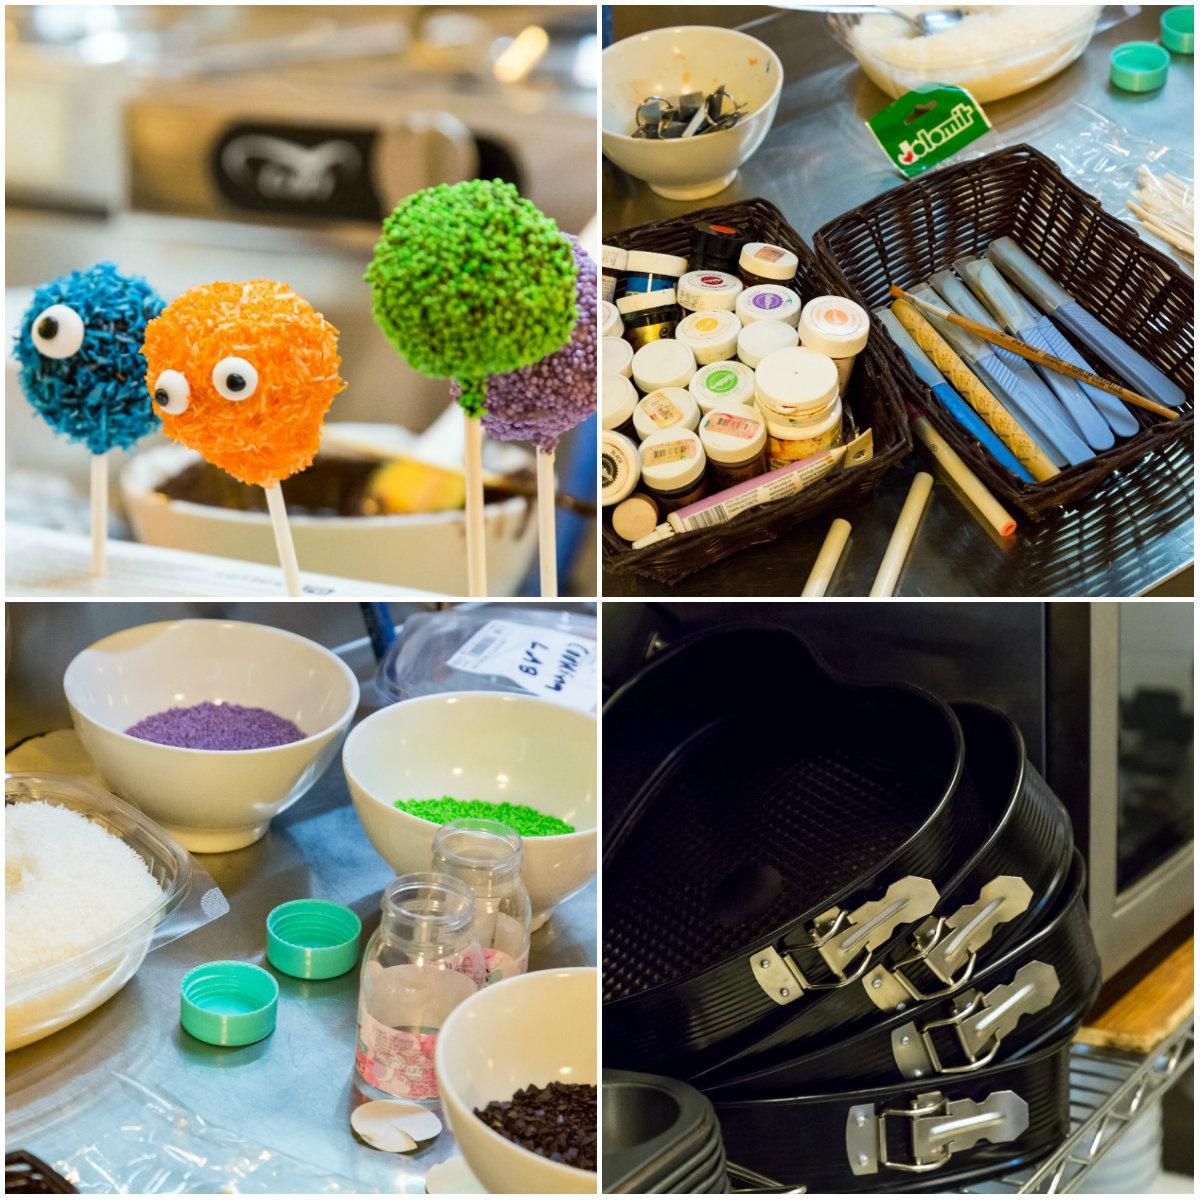 Dalani-California Bakery-Cucina-Dolci-Ricette-Stile